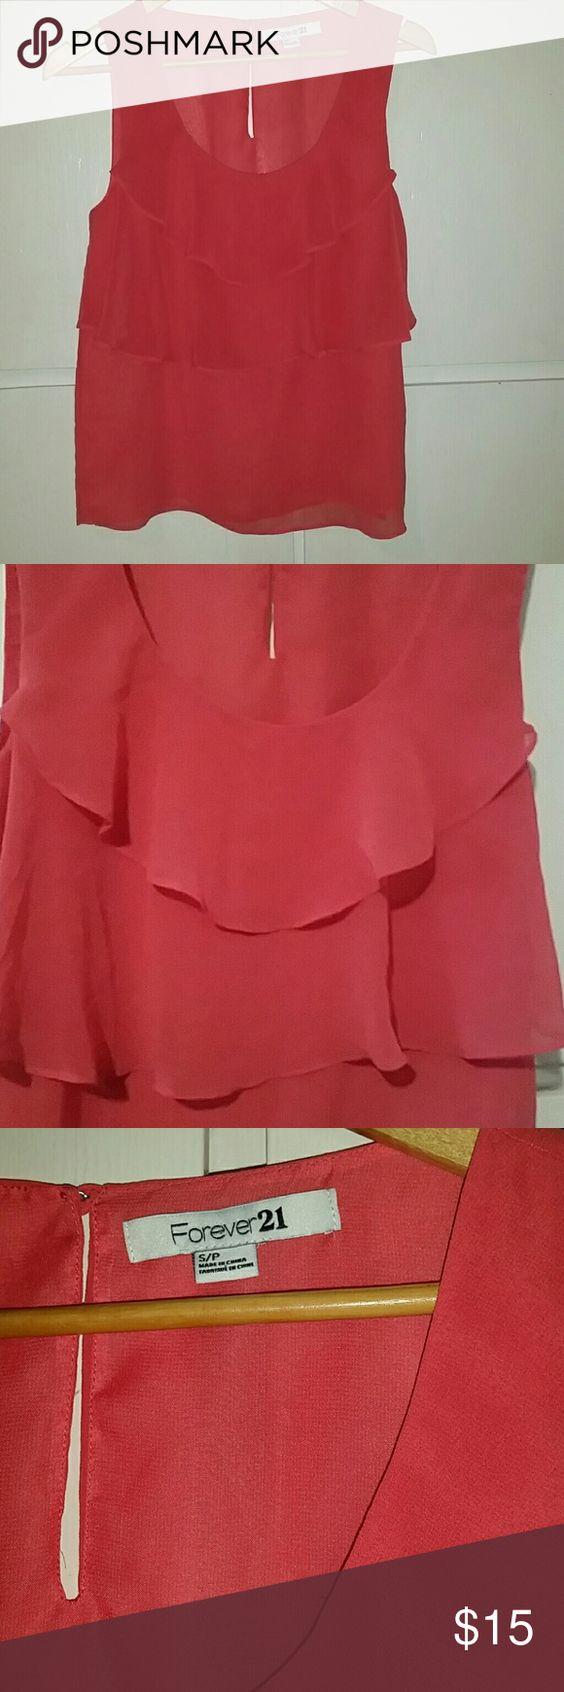 Forever 21 sleeveless flowy blouse Forever 21 sleeveless flowy blouse  Size S Shell: 100% polyester Lining: 100% polyester Forever 21 Tops Blouses